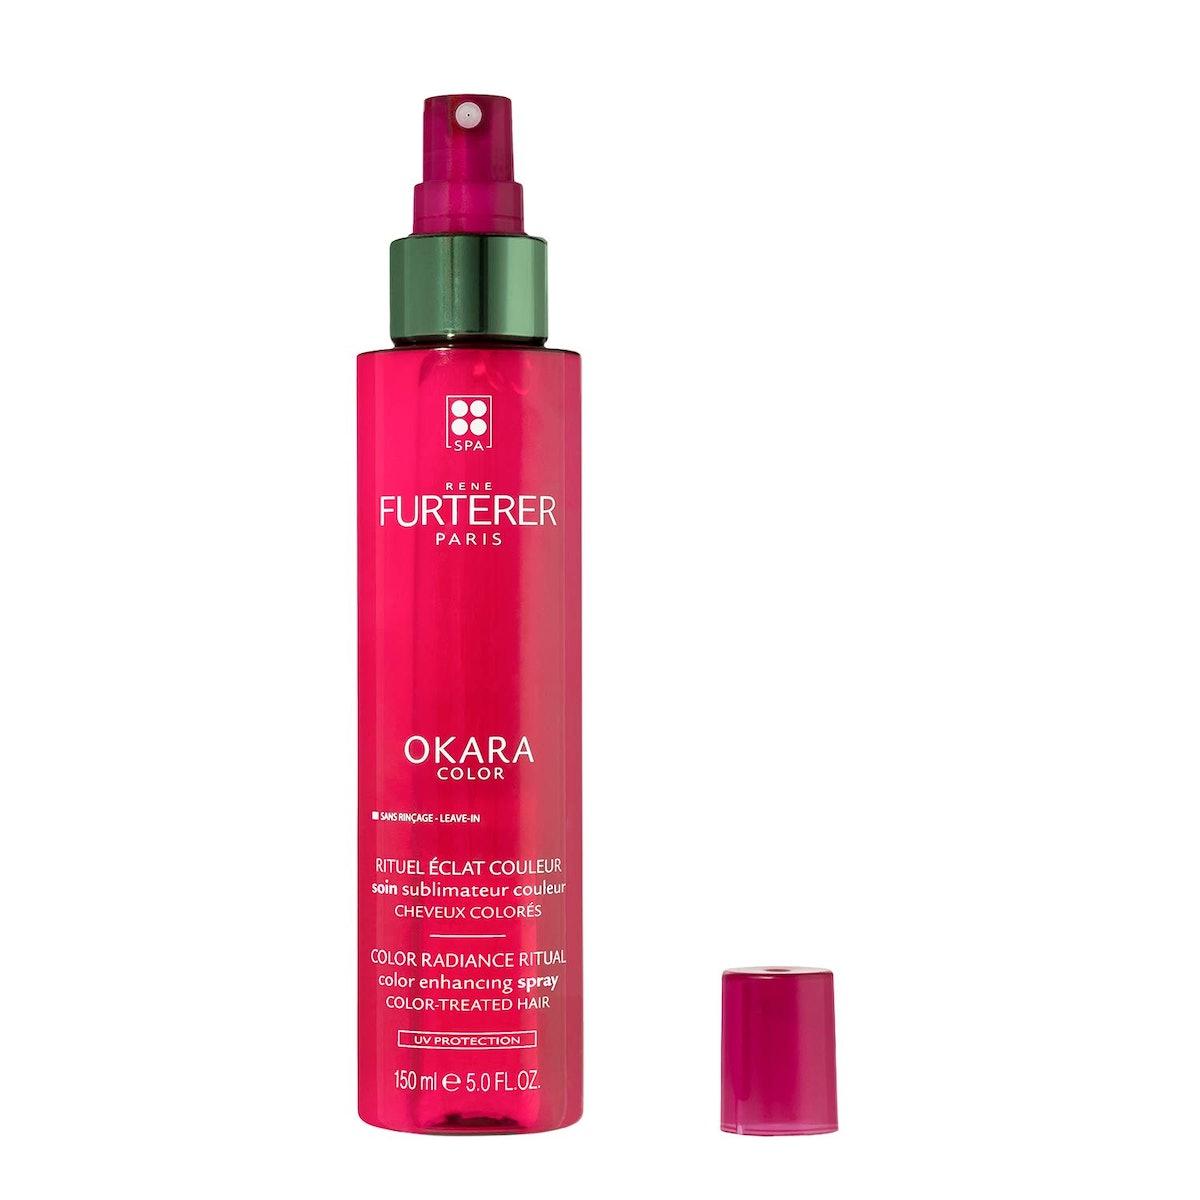 OKARA Color Protection Spray